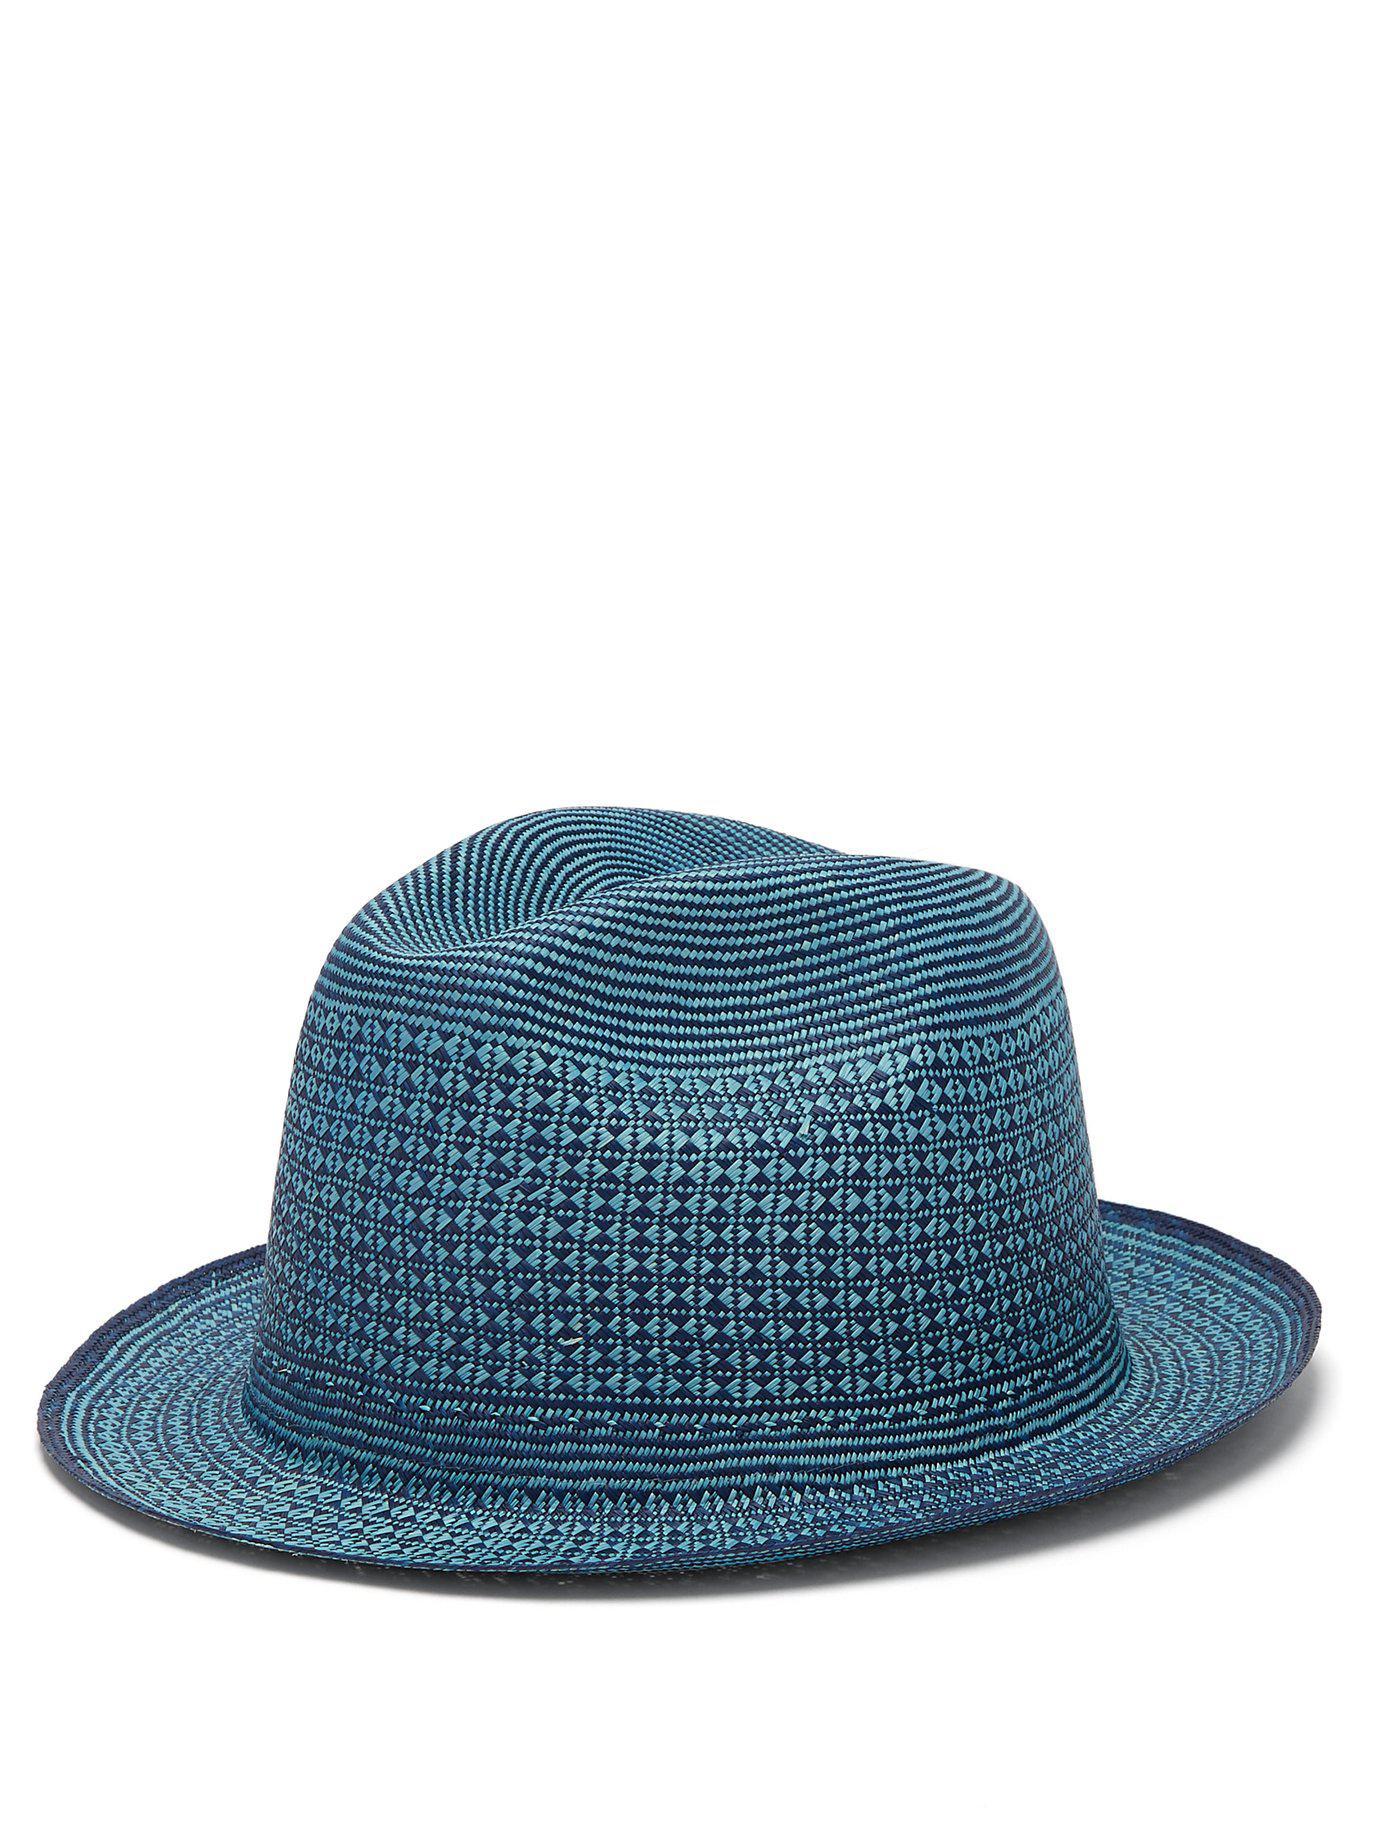 4a1ed608 Guanabana - Blue Geometric Straw Panama Hat for Men - Lyst. View fullscreen